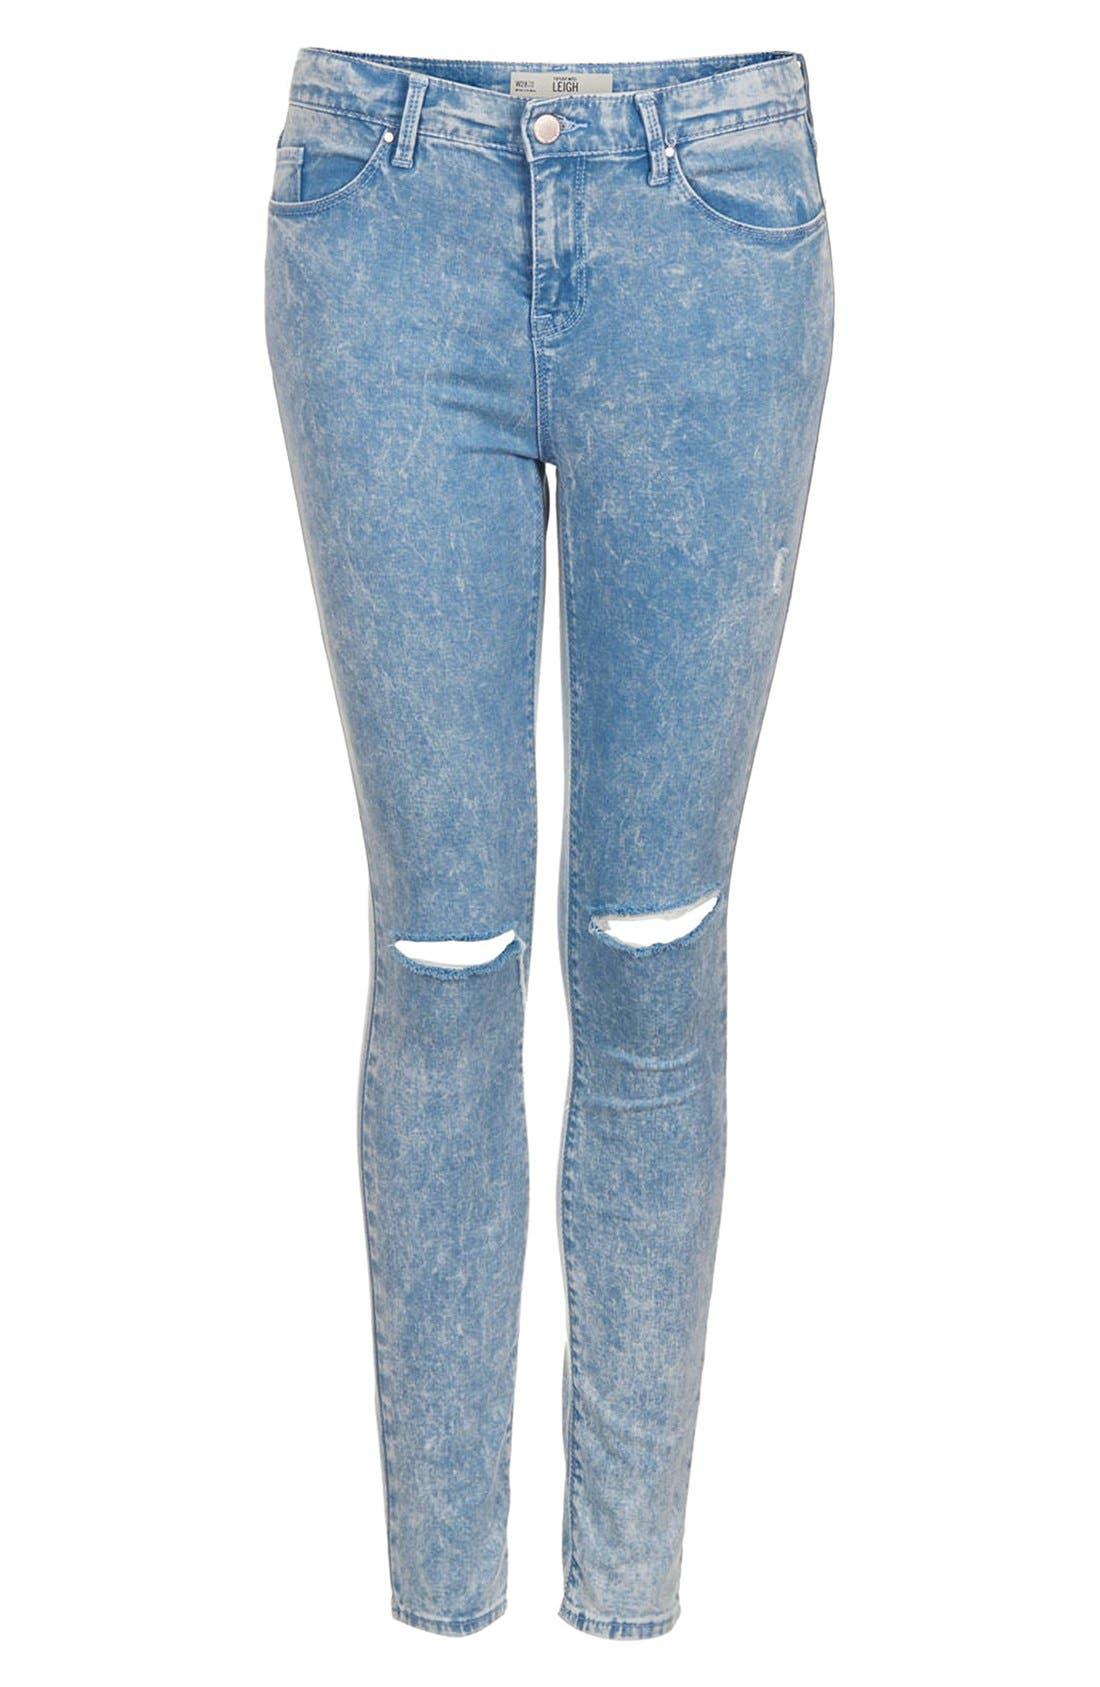 Alternate Image 3  - Topshop Moto 'Leigh' Acid Wash Ripped Skinny Jeans (Light Blue) (Regular & Short)